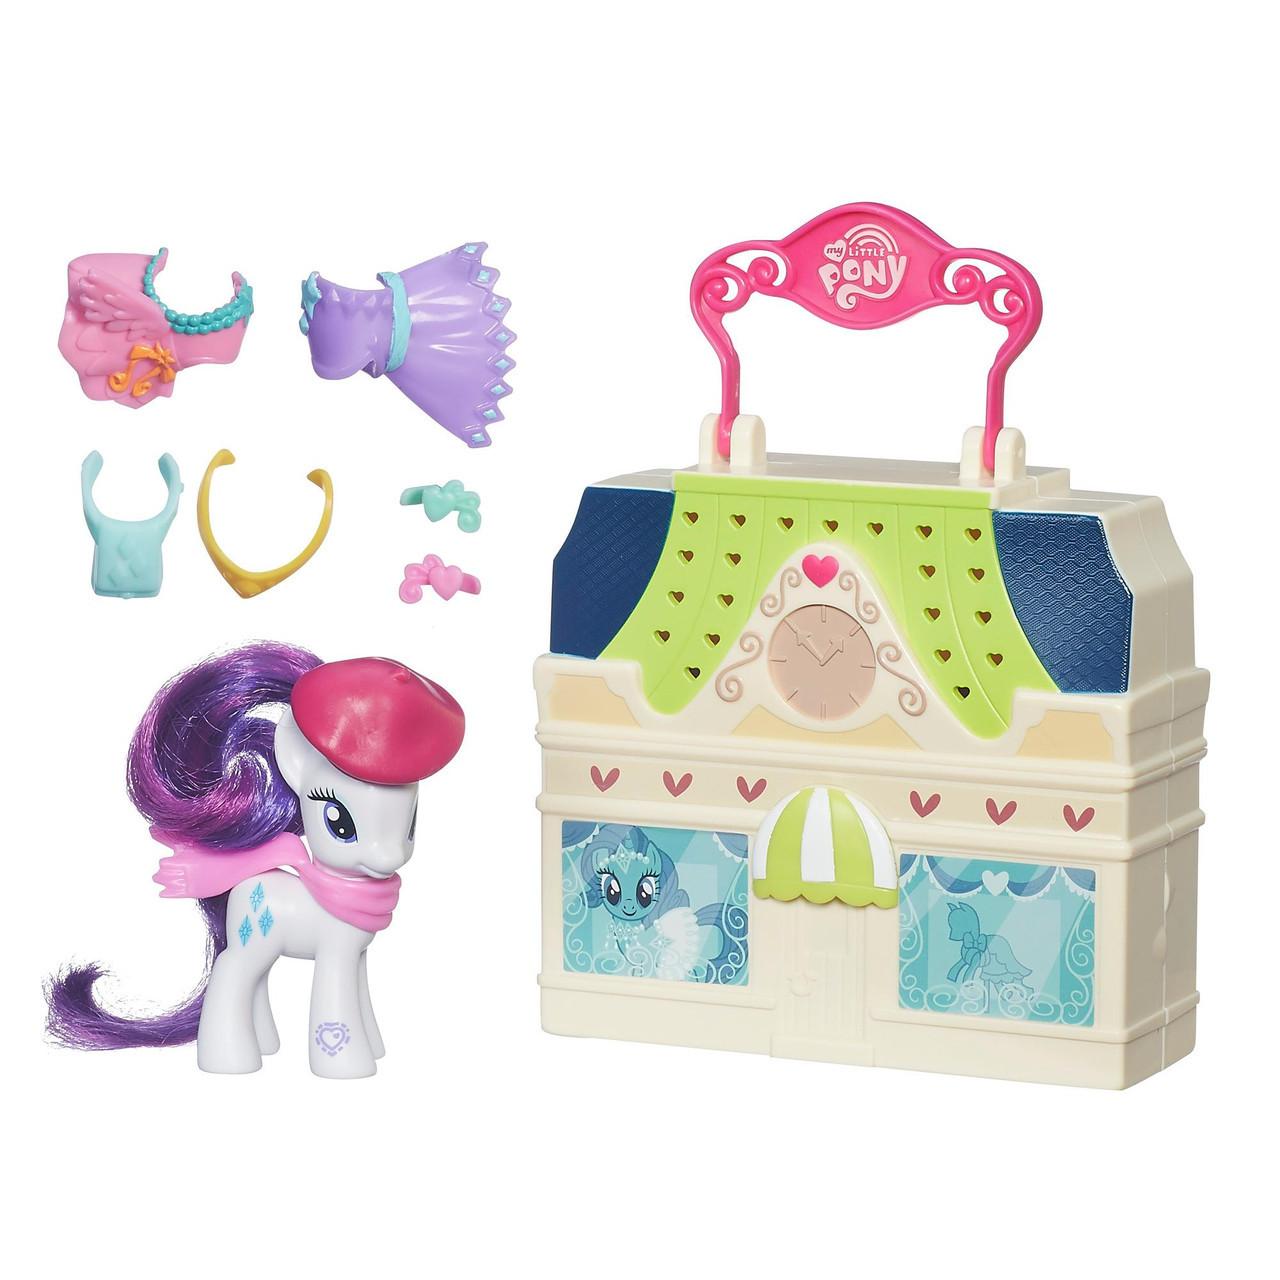 Пони игровой набор Магазин Рарити Май Литл Пони My Little Pony Friendship is Magic Rarity Dress Shop Playset